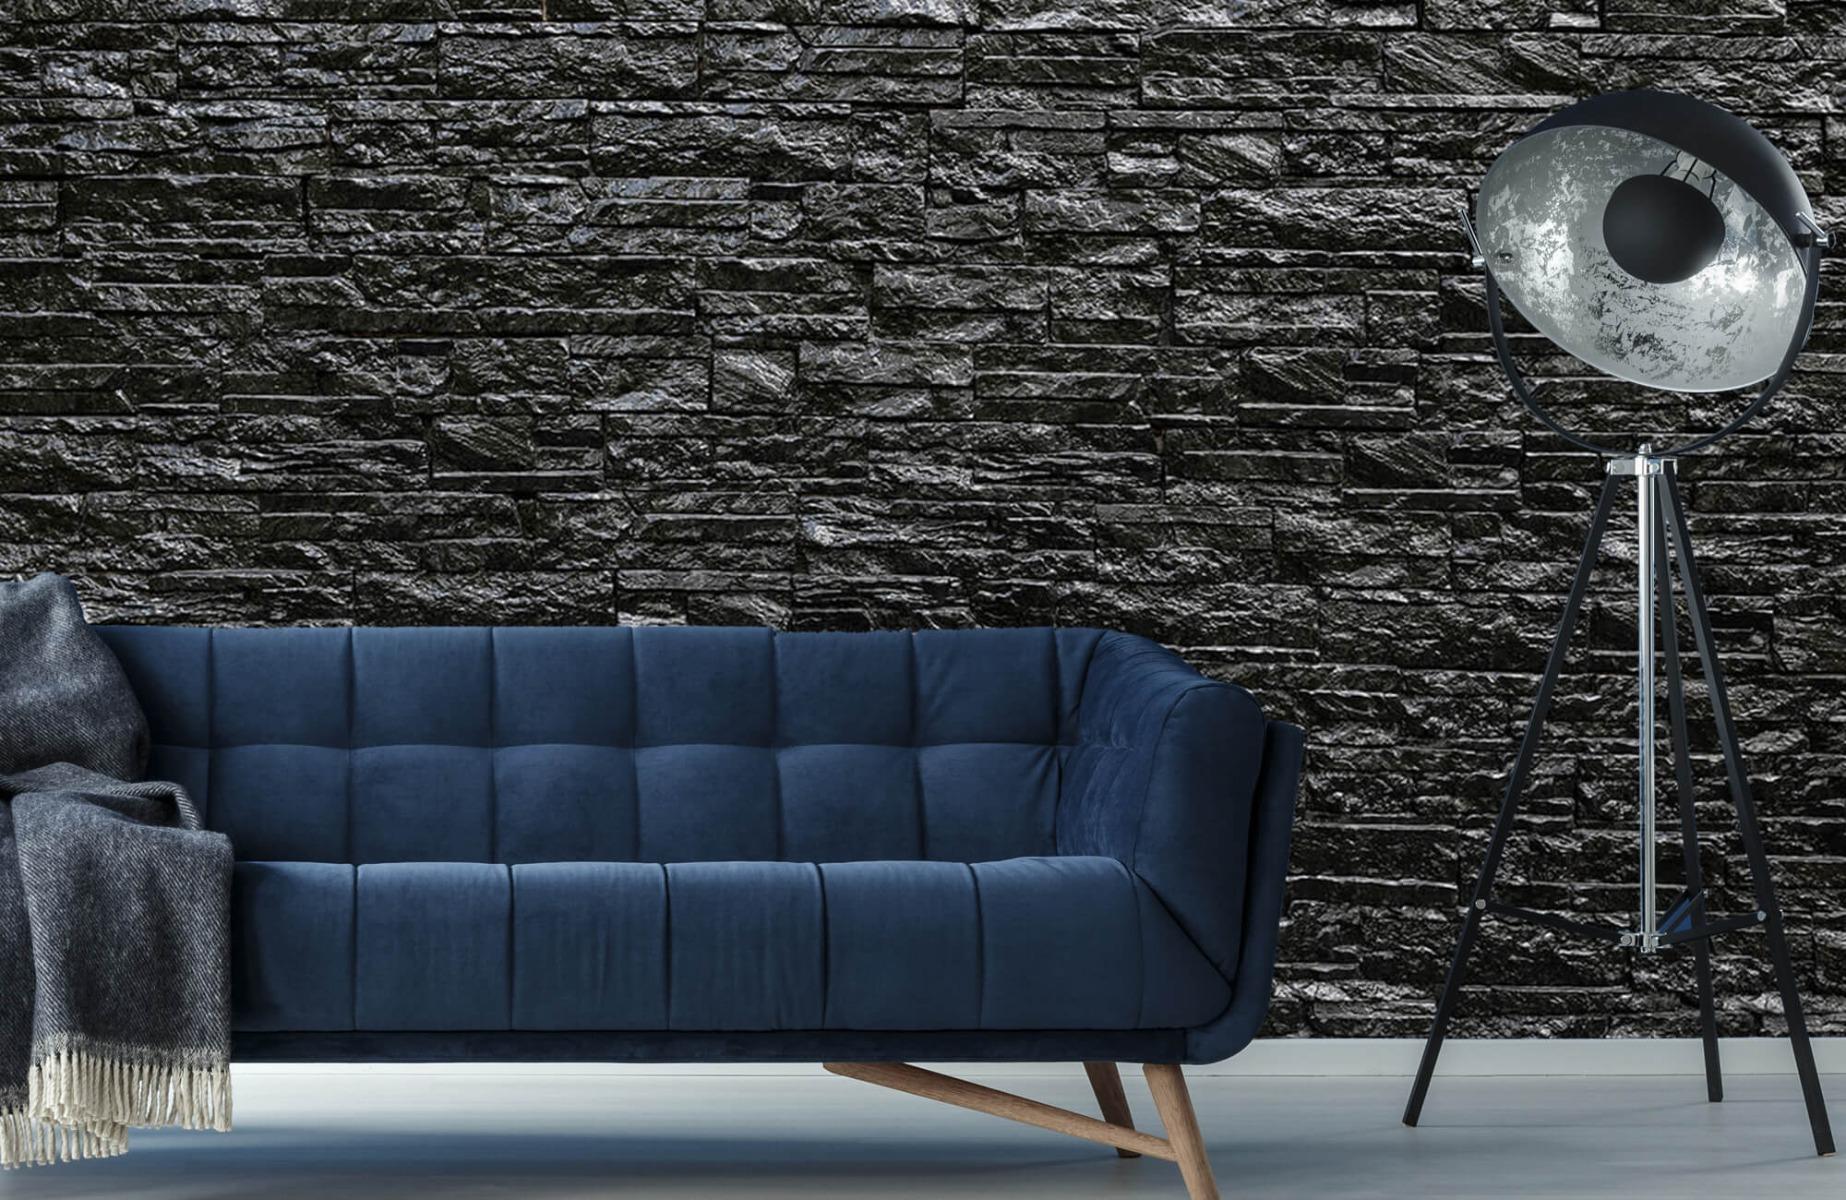 Steen behang - Zwarte stenen - Slaapkamer 10